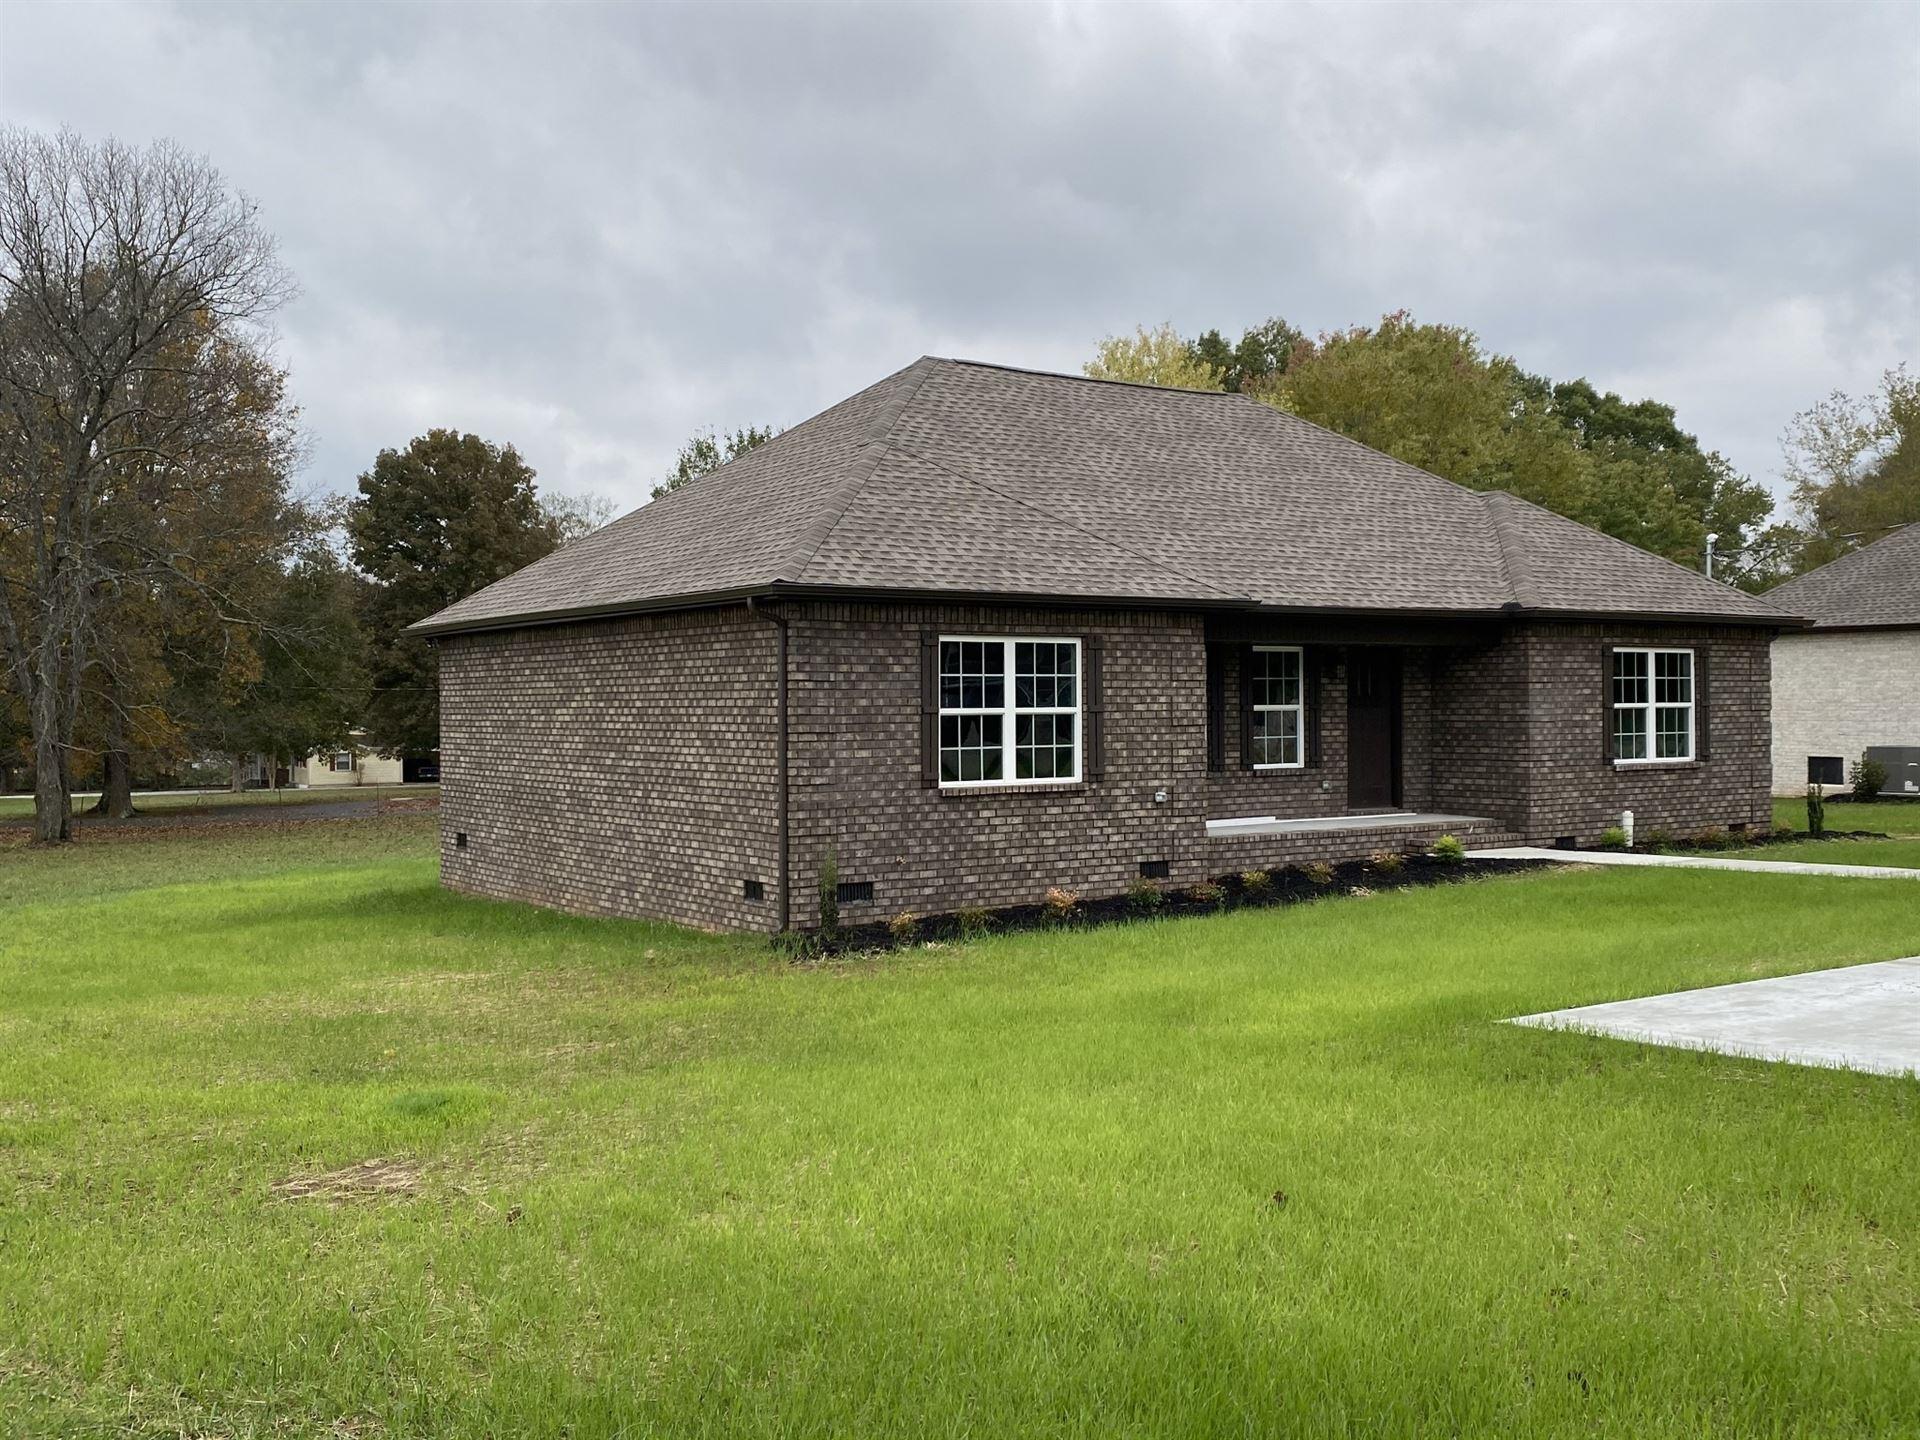 101A Richland Dr., Shelbyville, TN 37160 - MLS#: 2182661